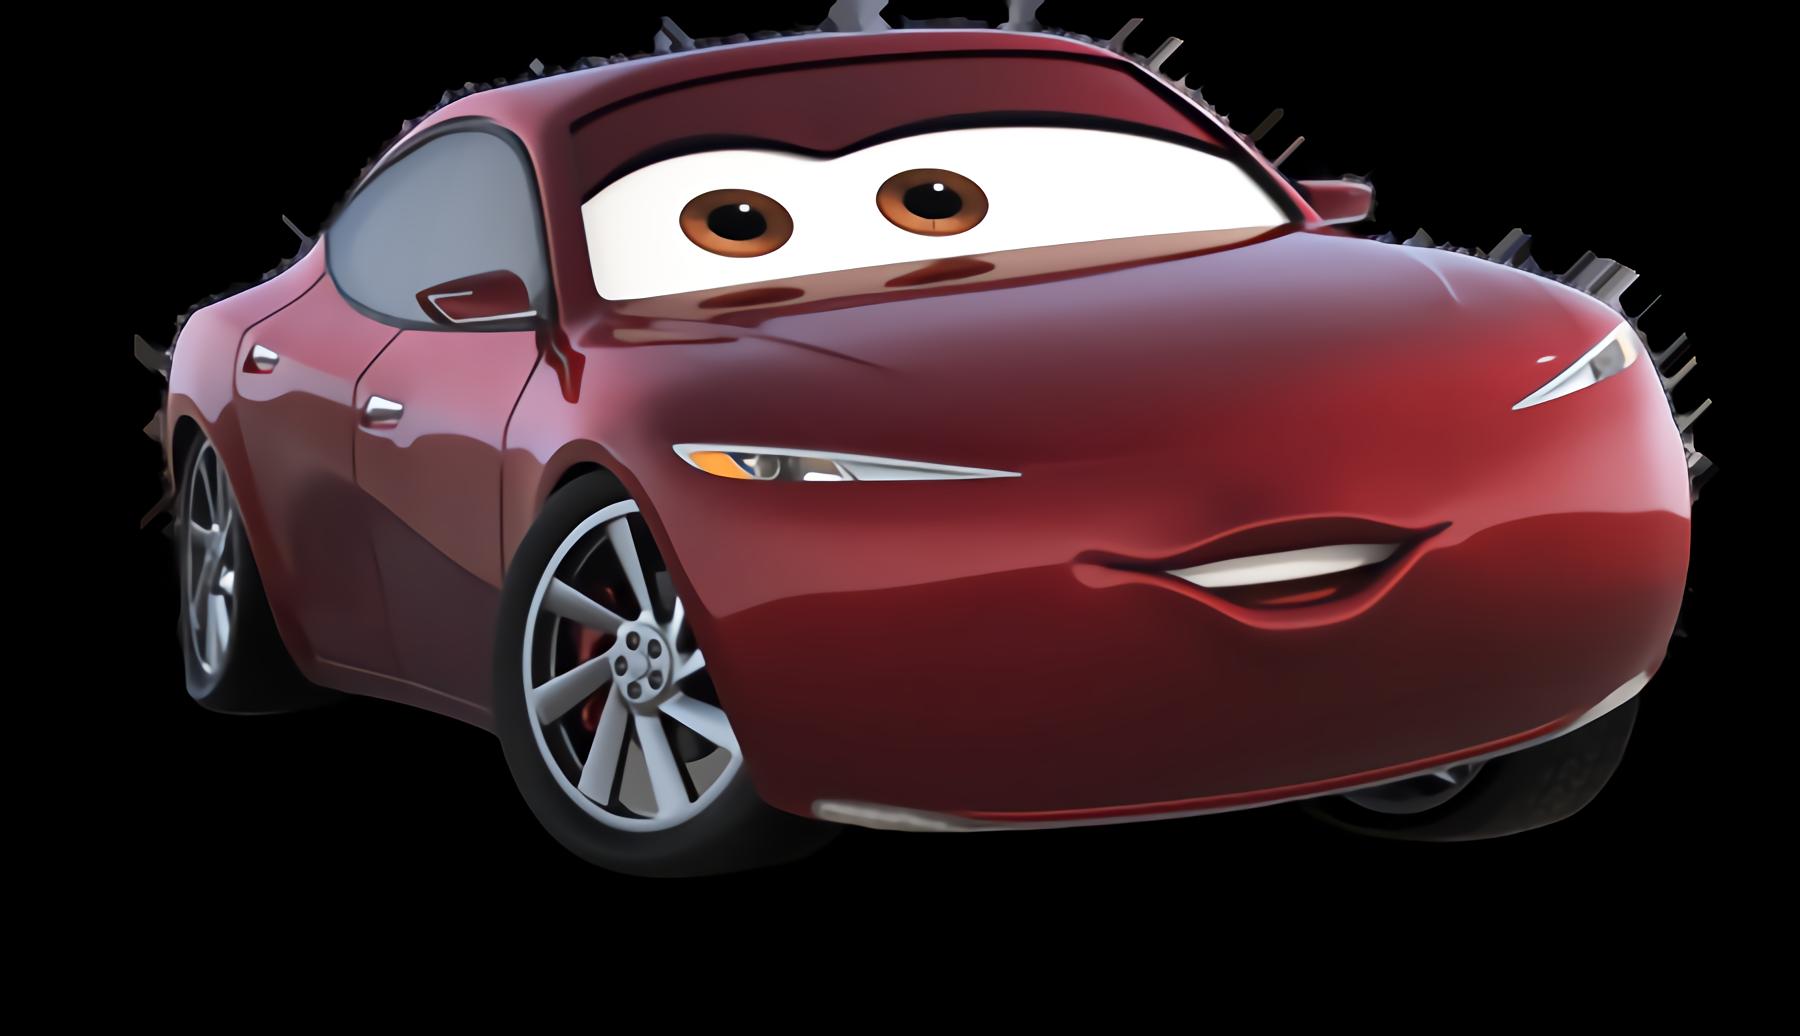 Evolv Motors